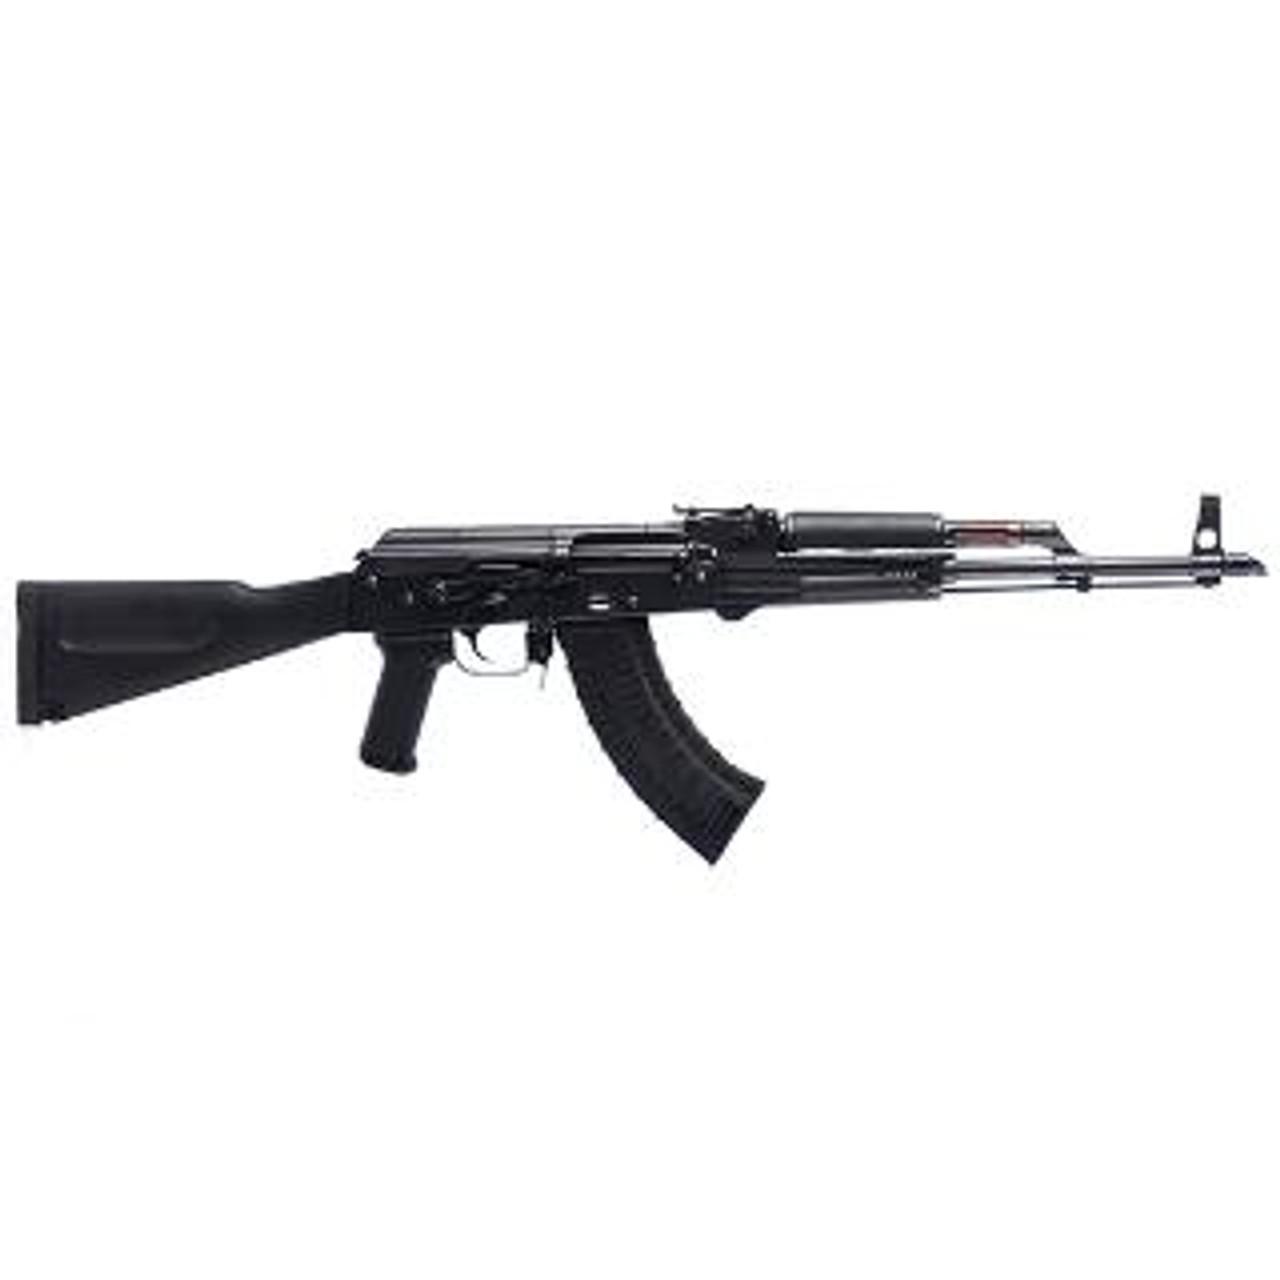 Riley Defense RAK47-P AK47 Polymer CALIFORNIA LEGAL - 7.62x39